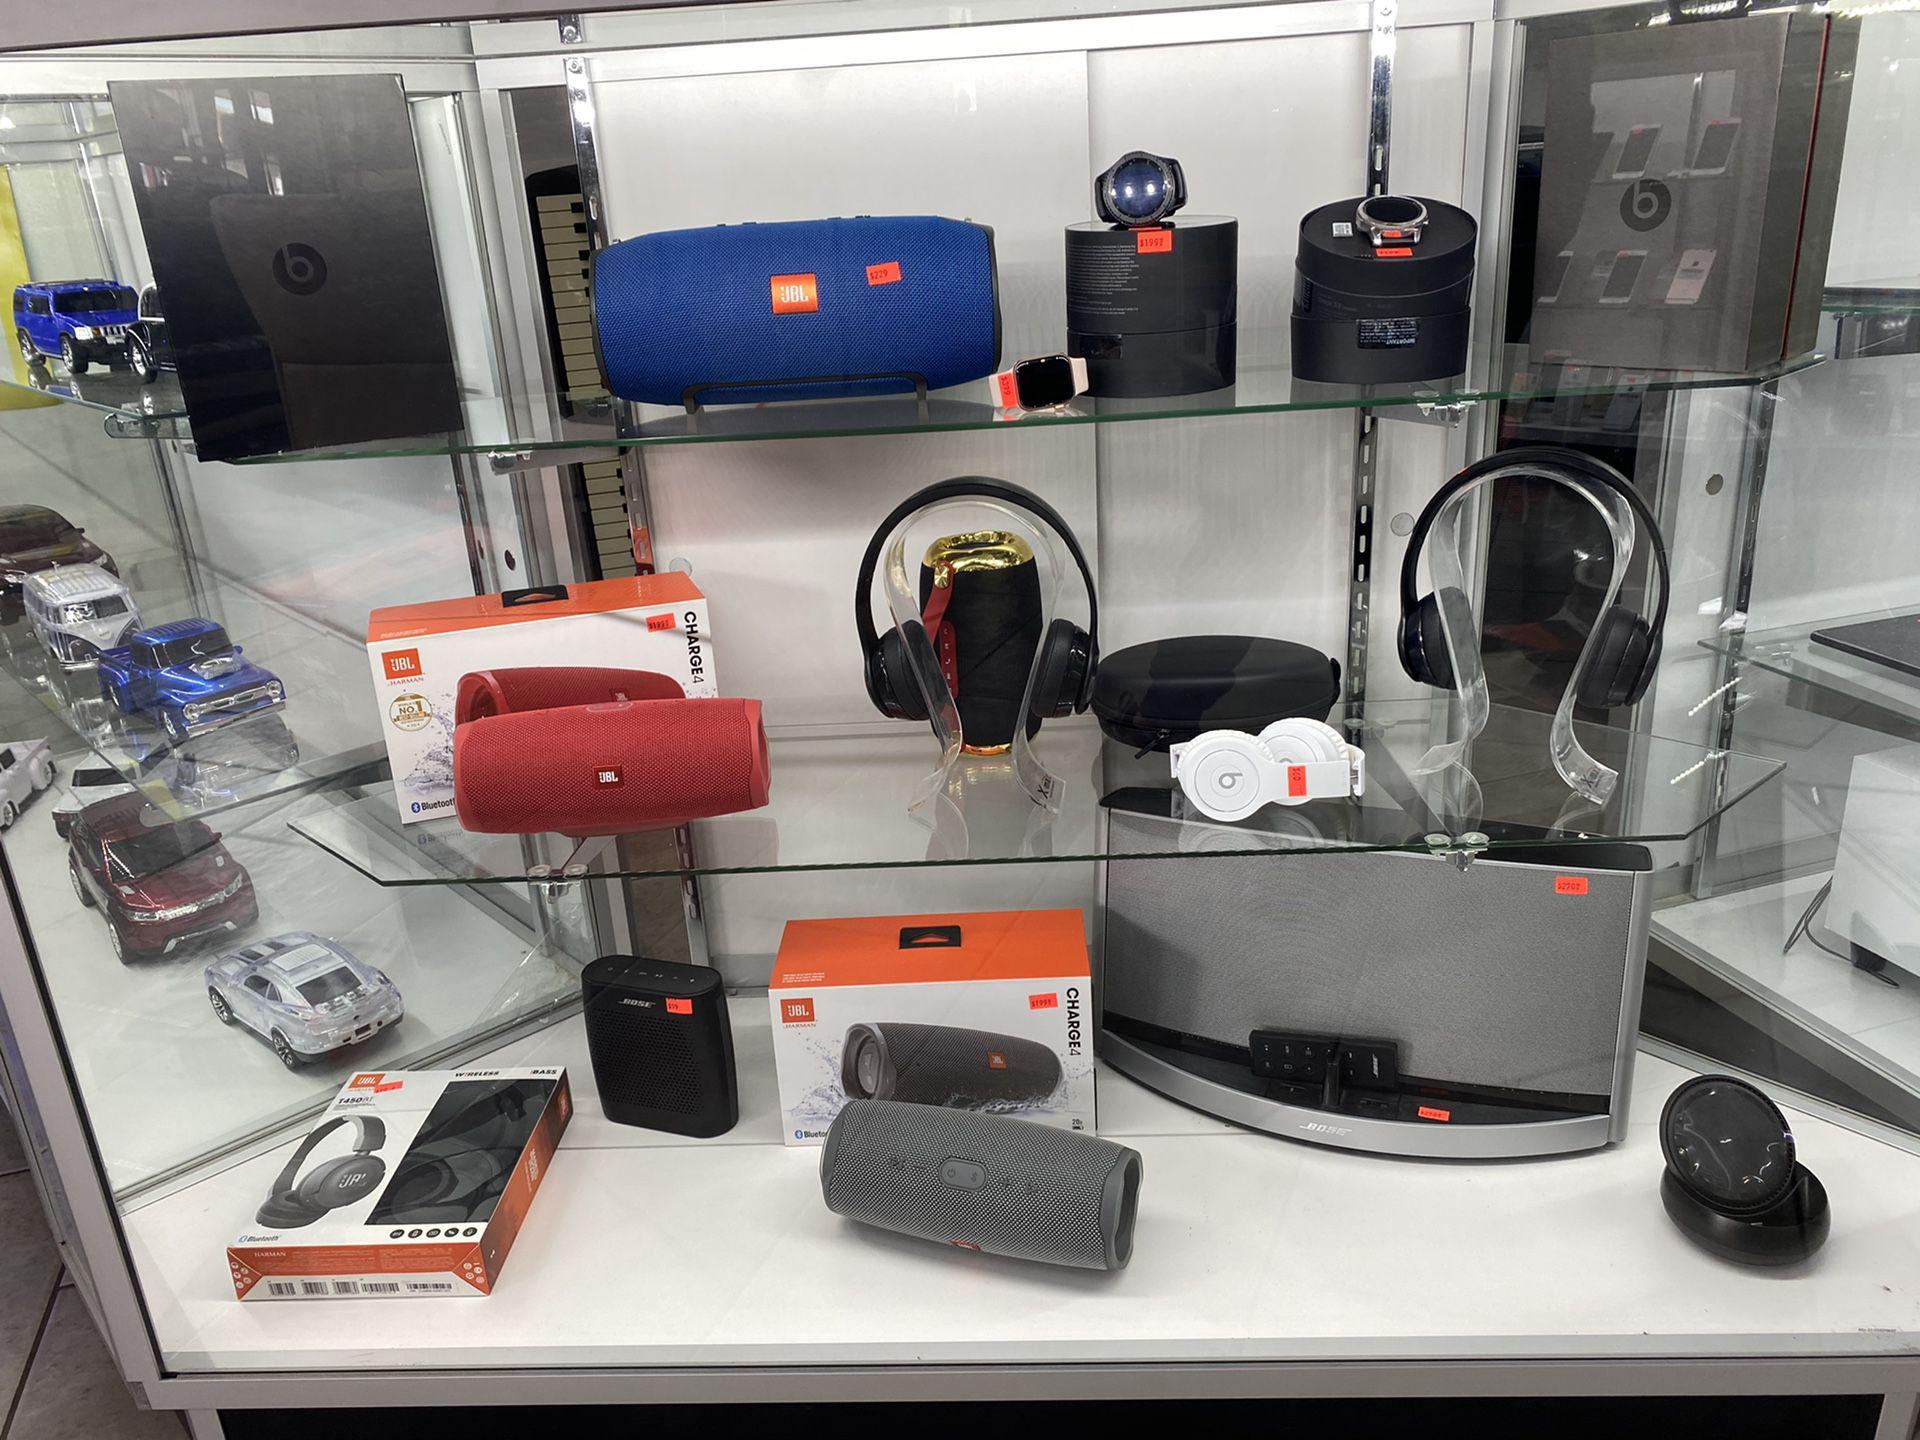 Speaker JBL, Bose, Beats For sale